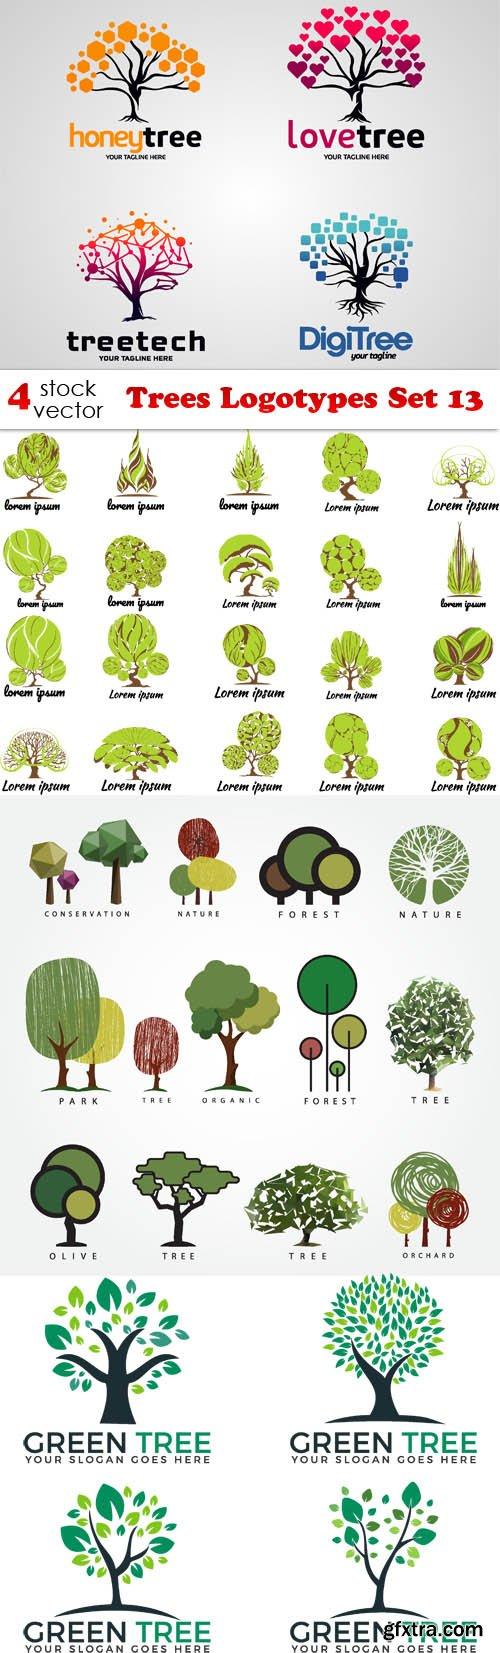 Vectors - Trees Logotypes Set 13